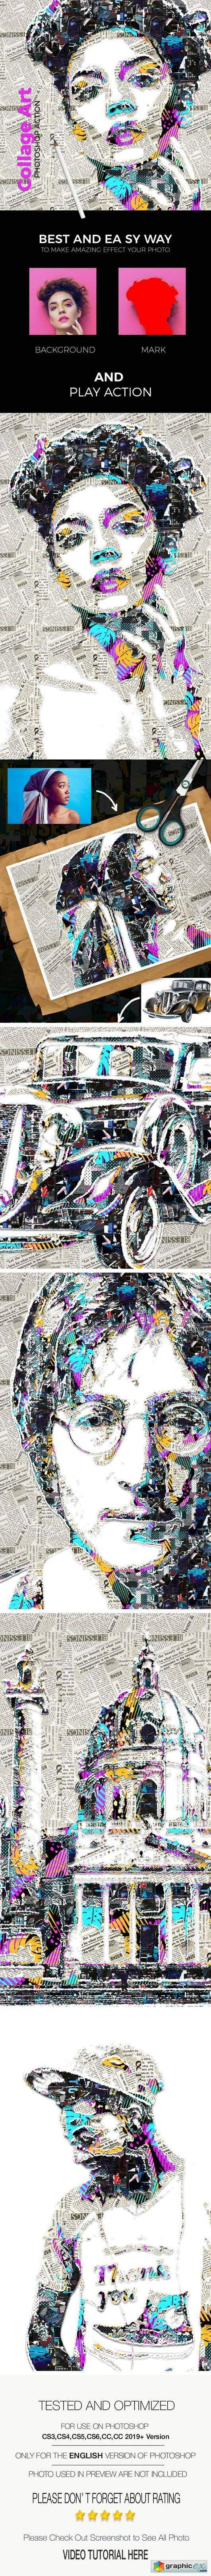 Collage Art Photoshop Action 24972417